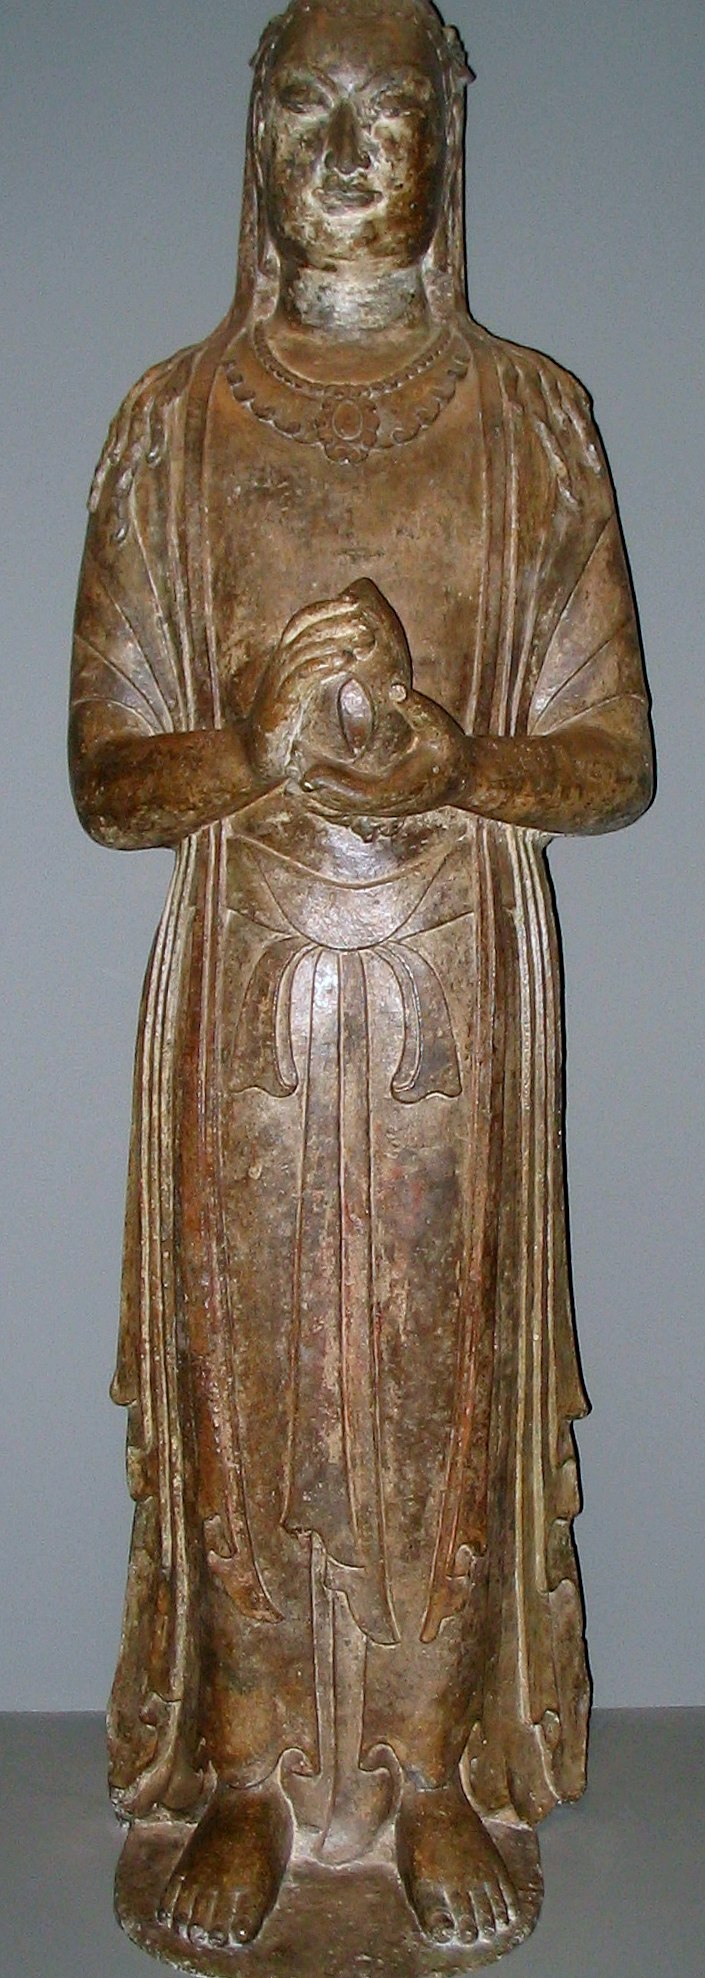 Chinese Boddhisattva statue